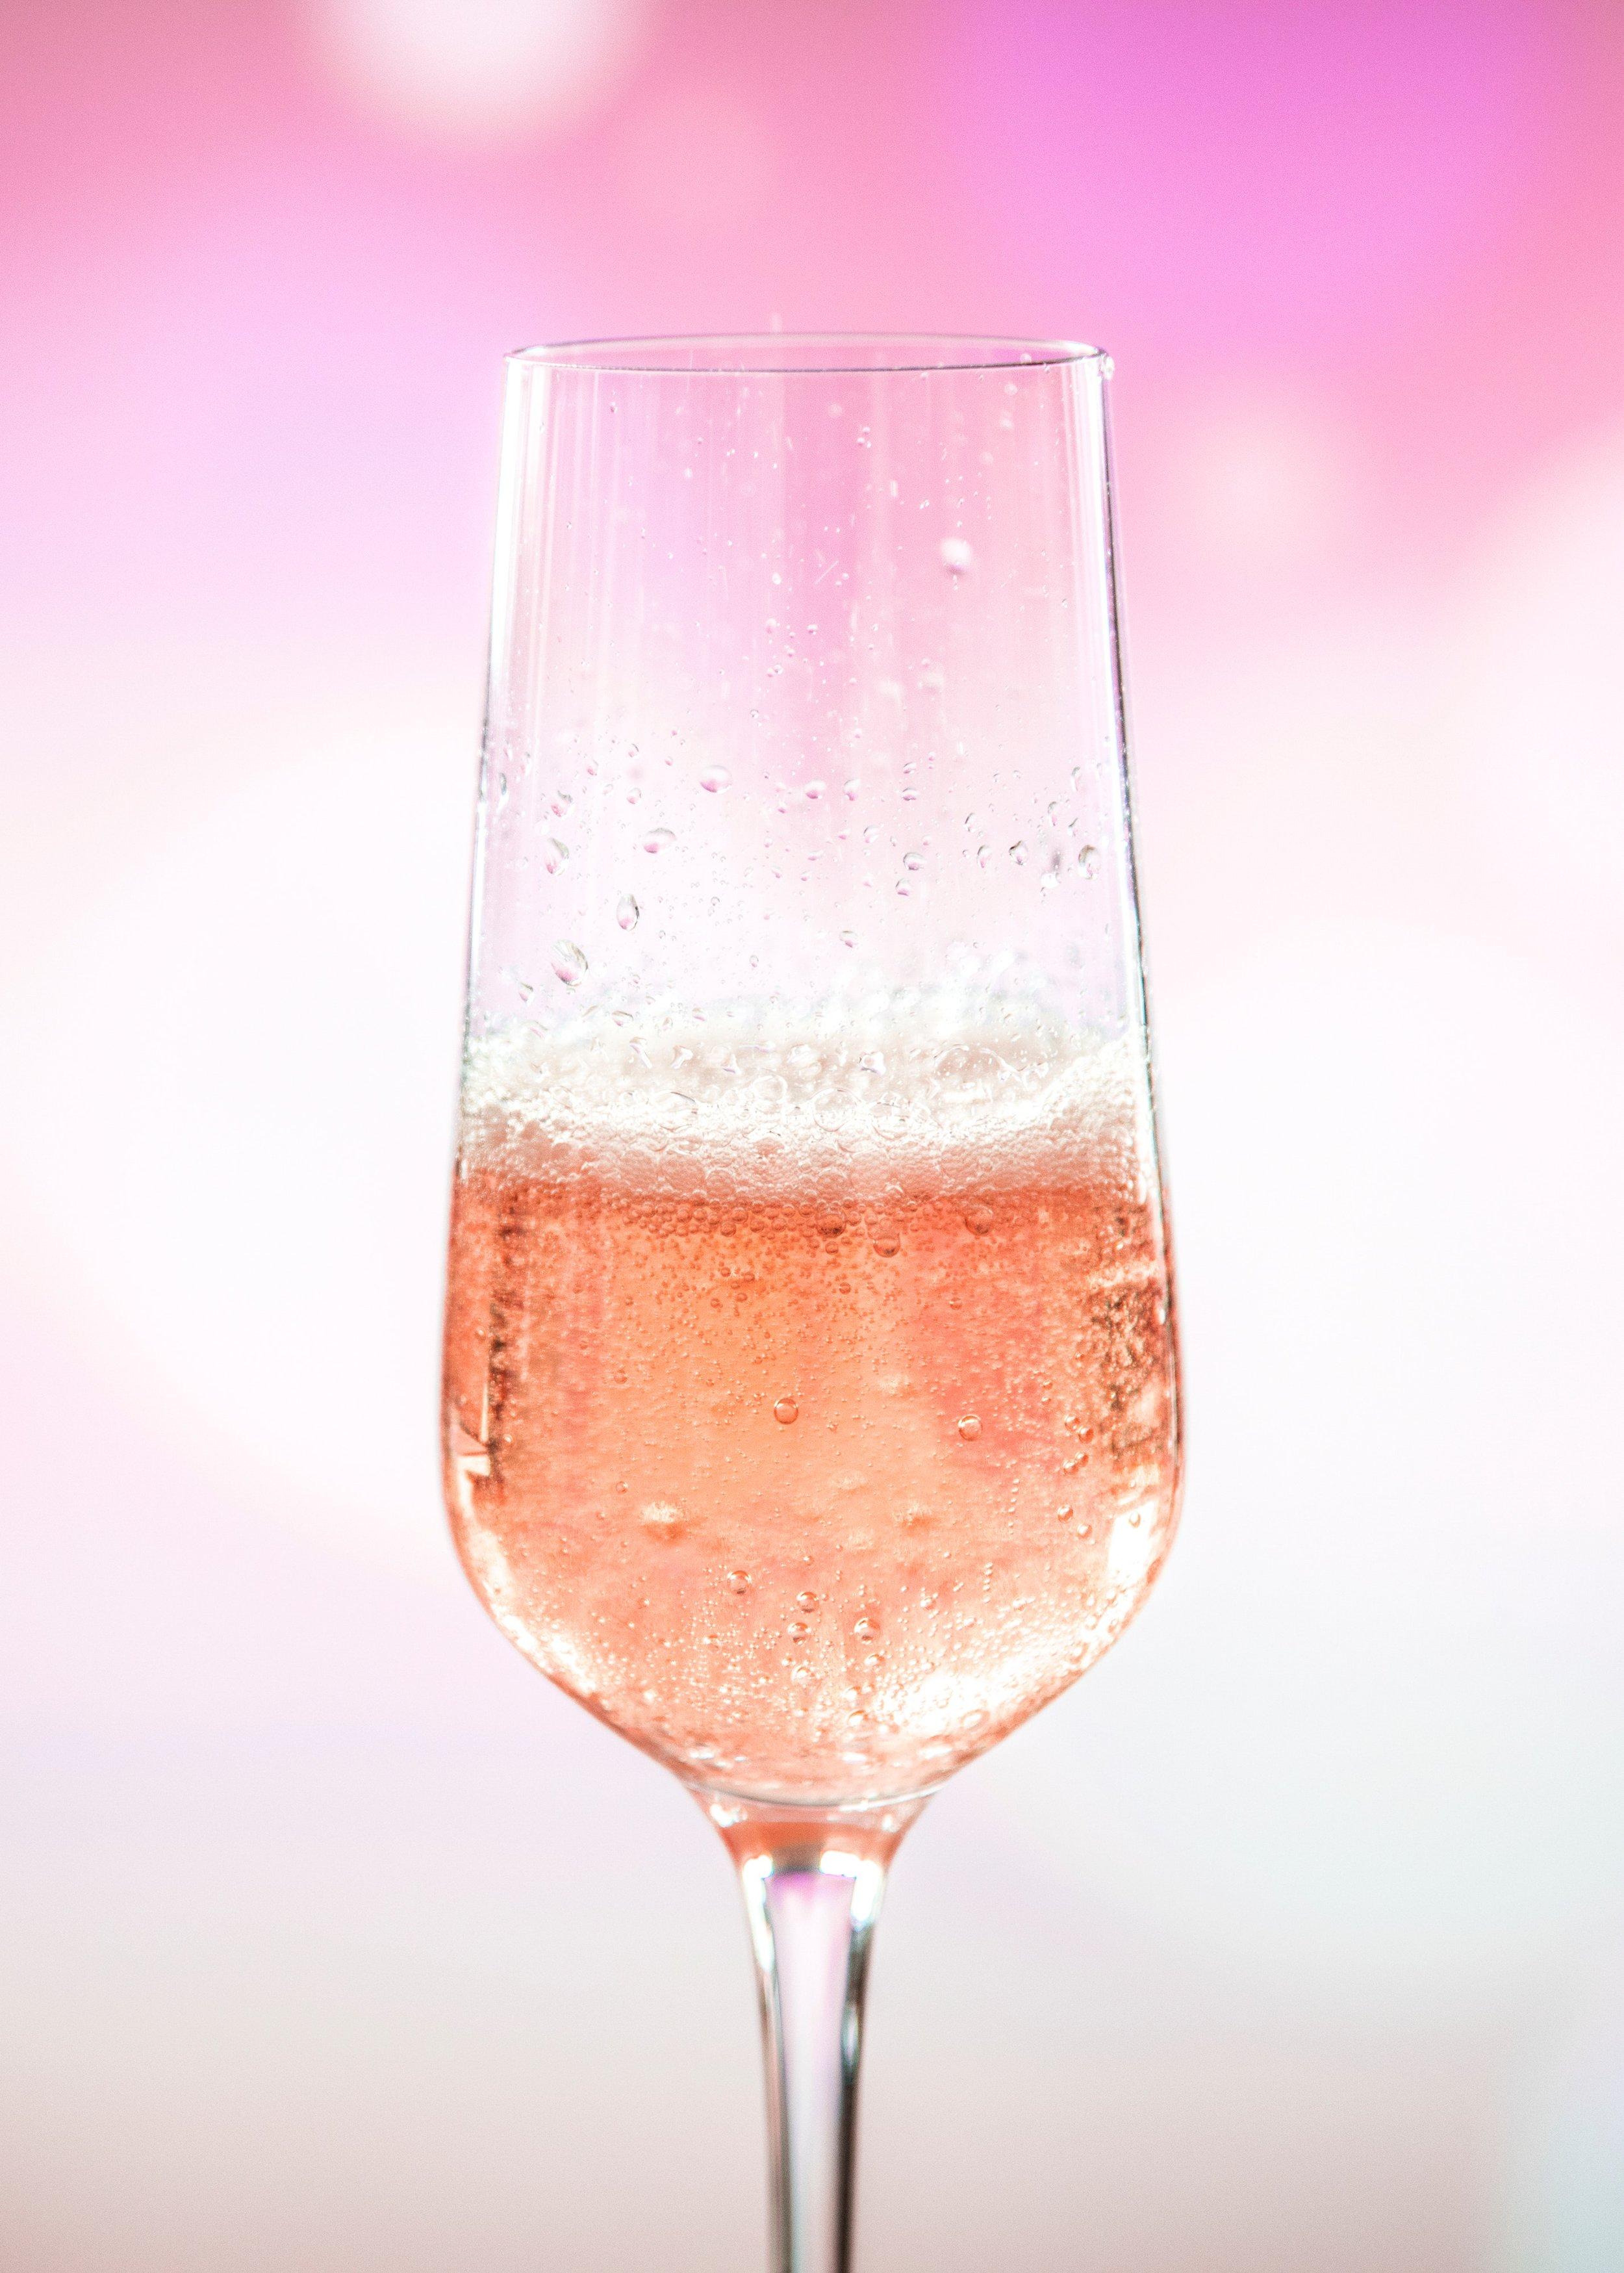 alcohol-alcoholic-beverage-anniversary-1571764.jpg